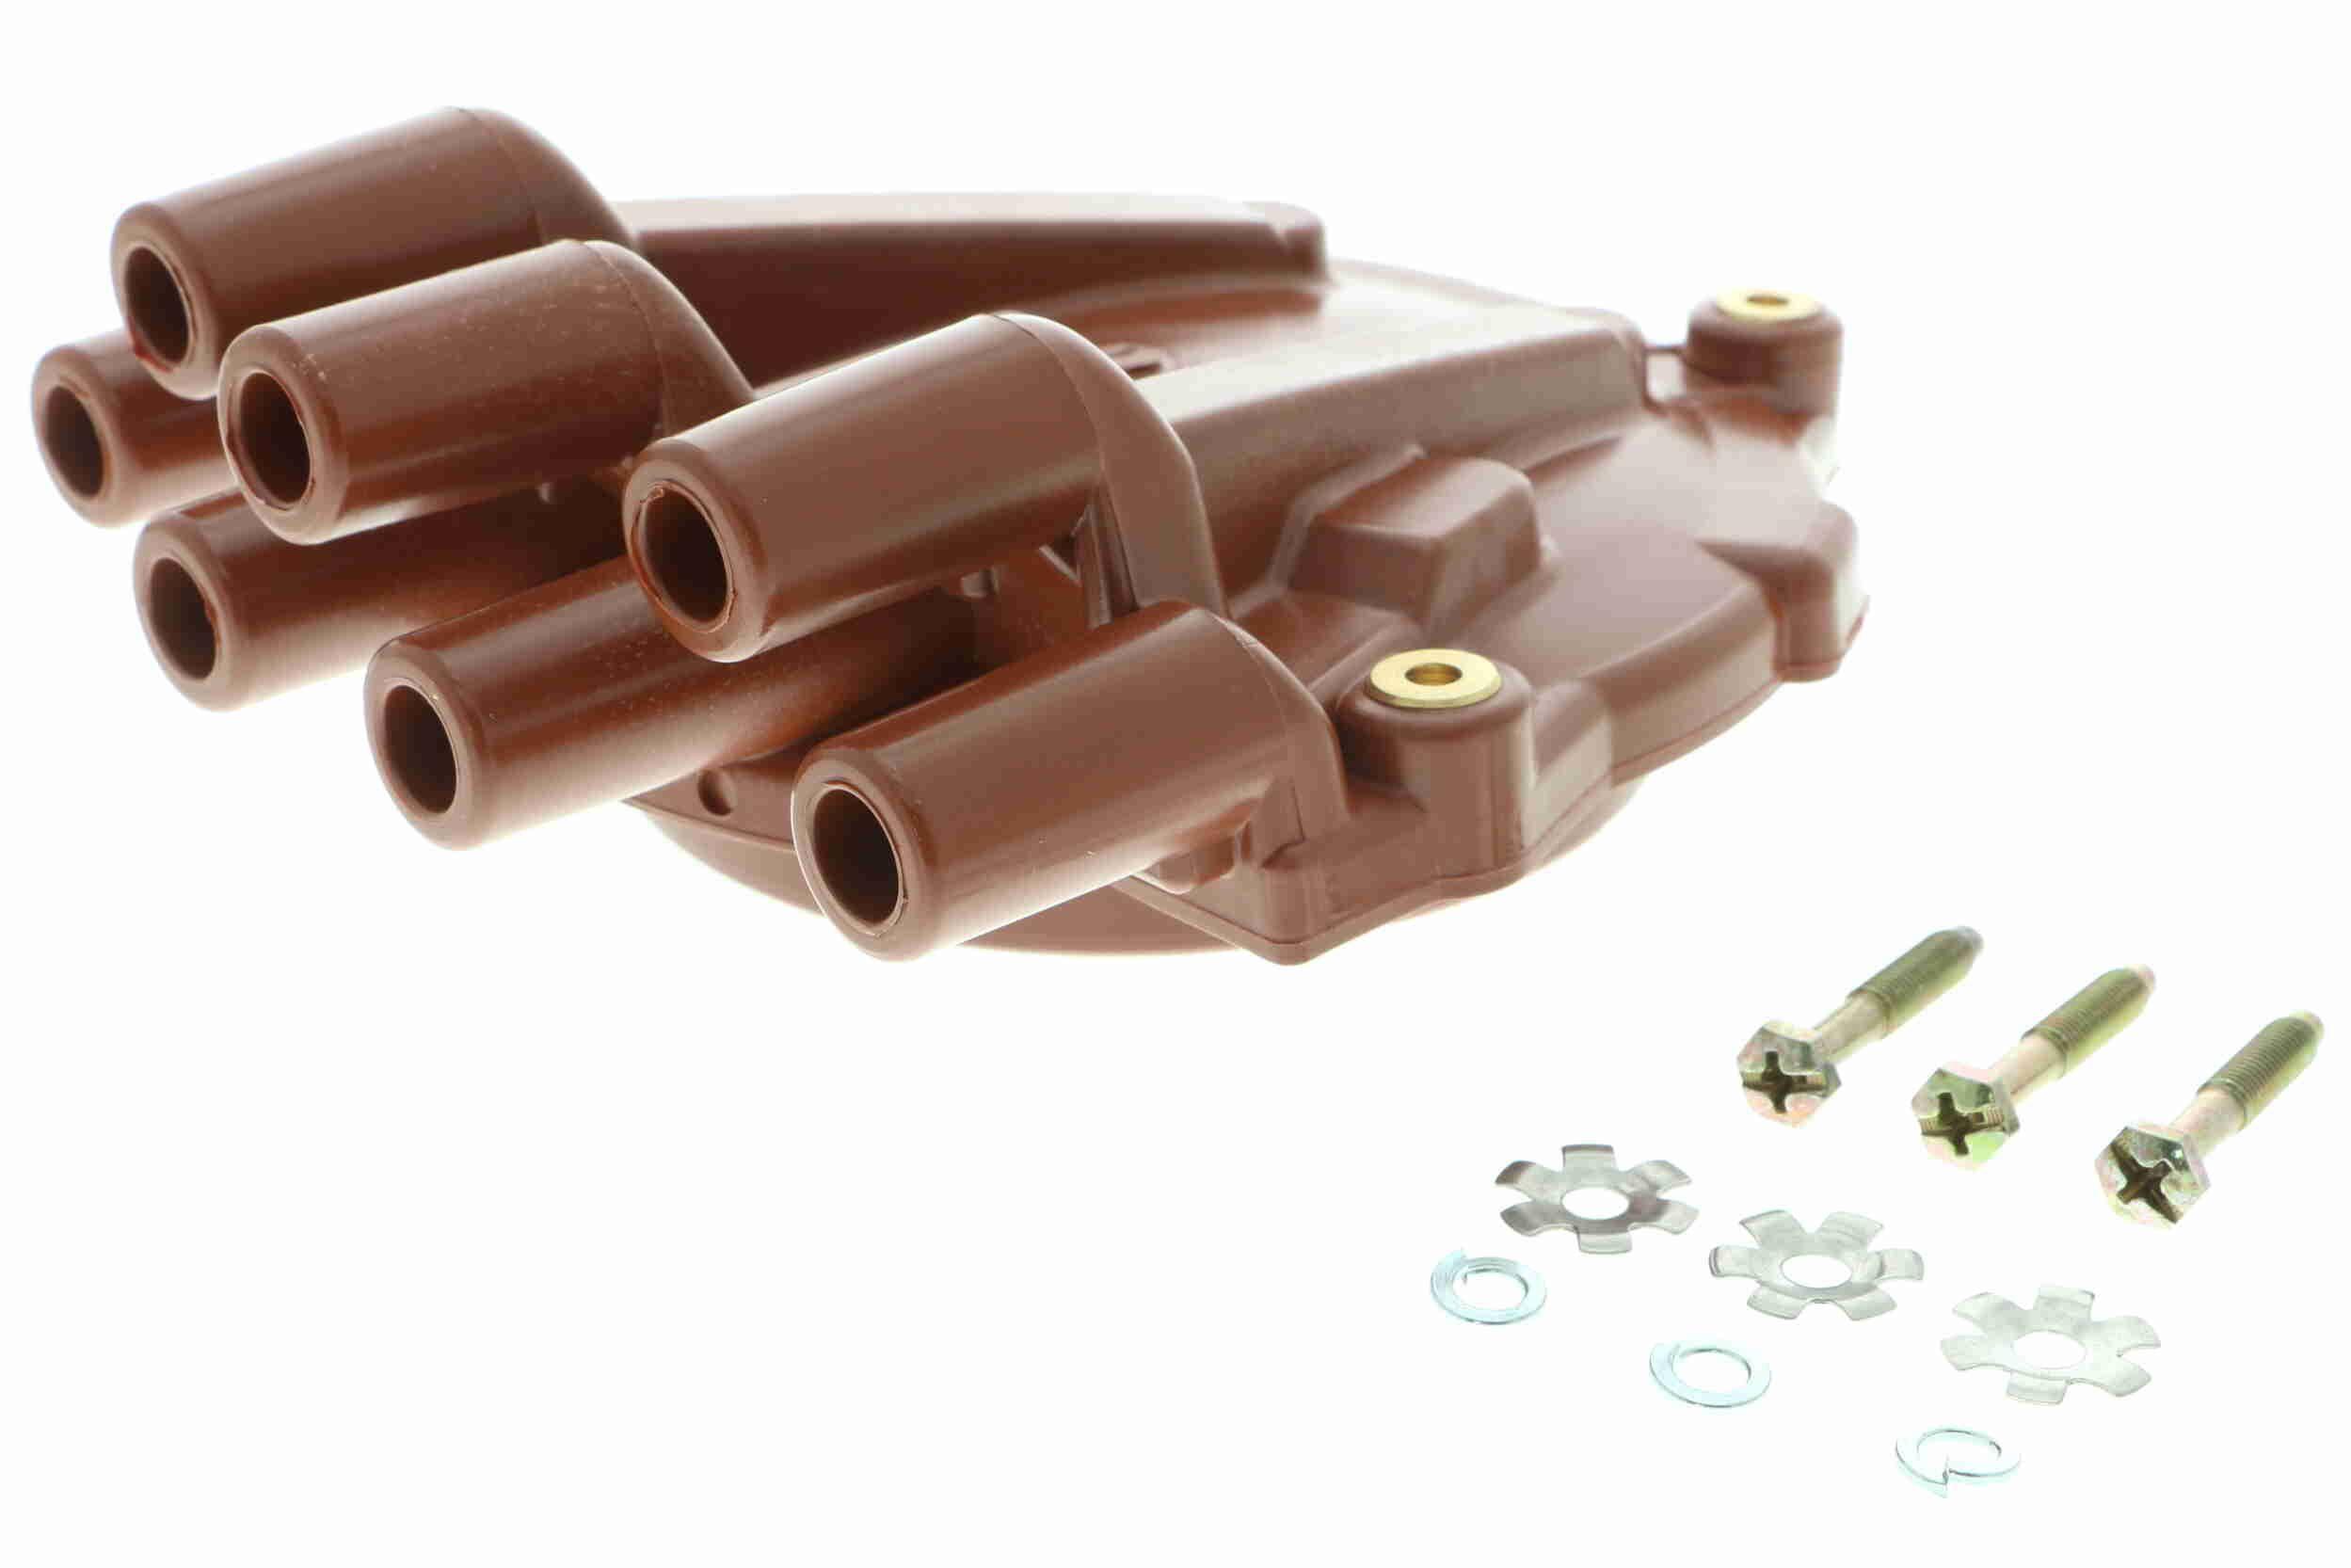 Verteilerkappe V20-70-0009 VEMO V20-70-0009 in Original Qualität